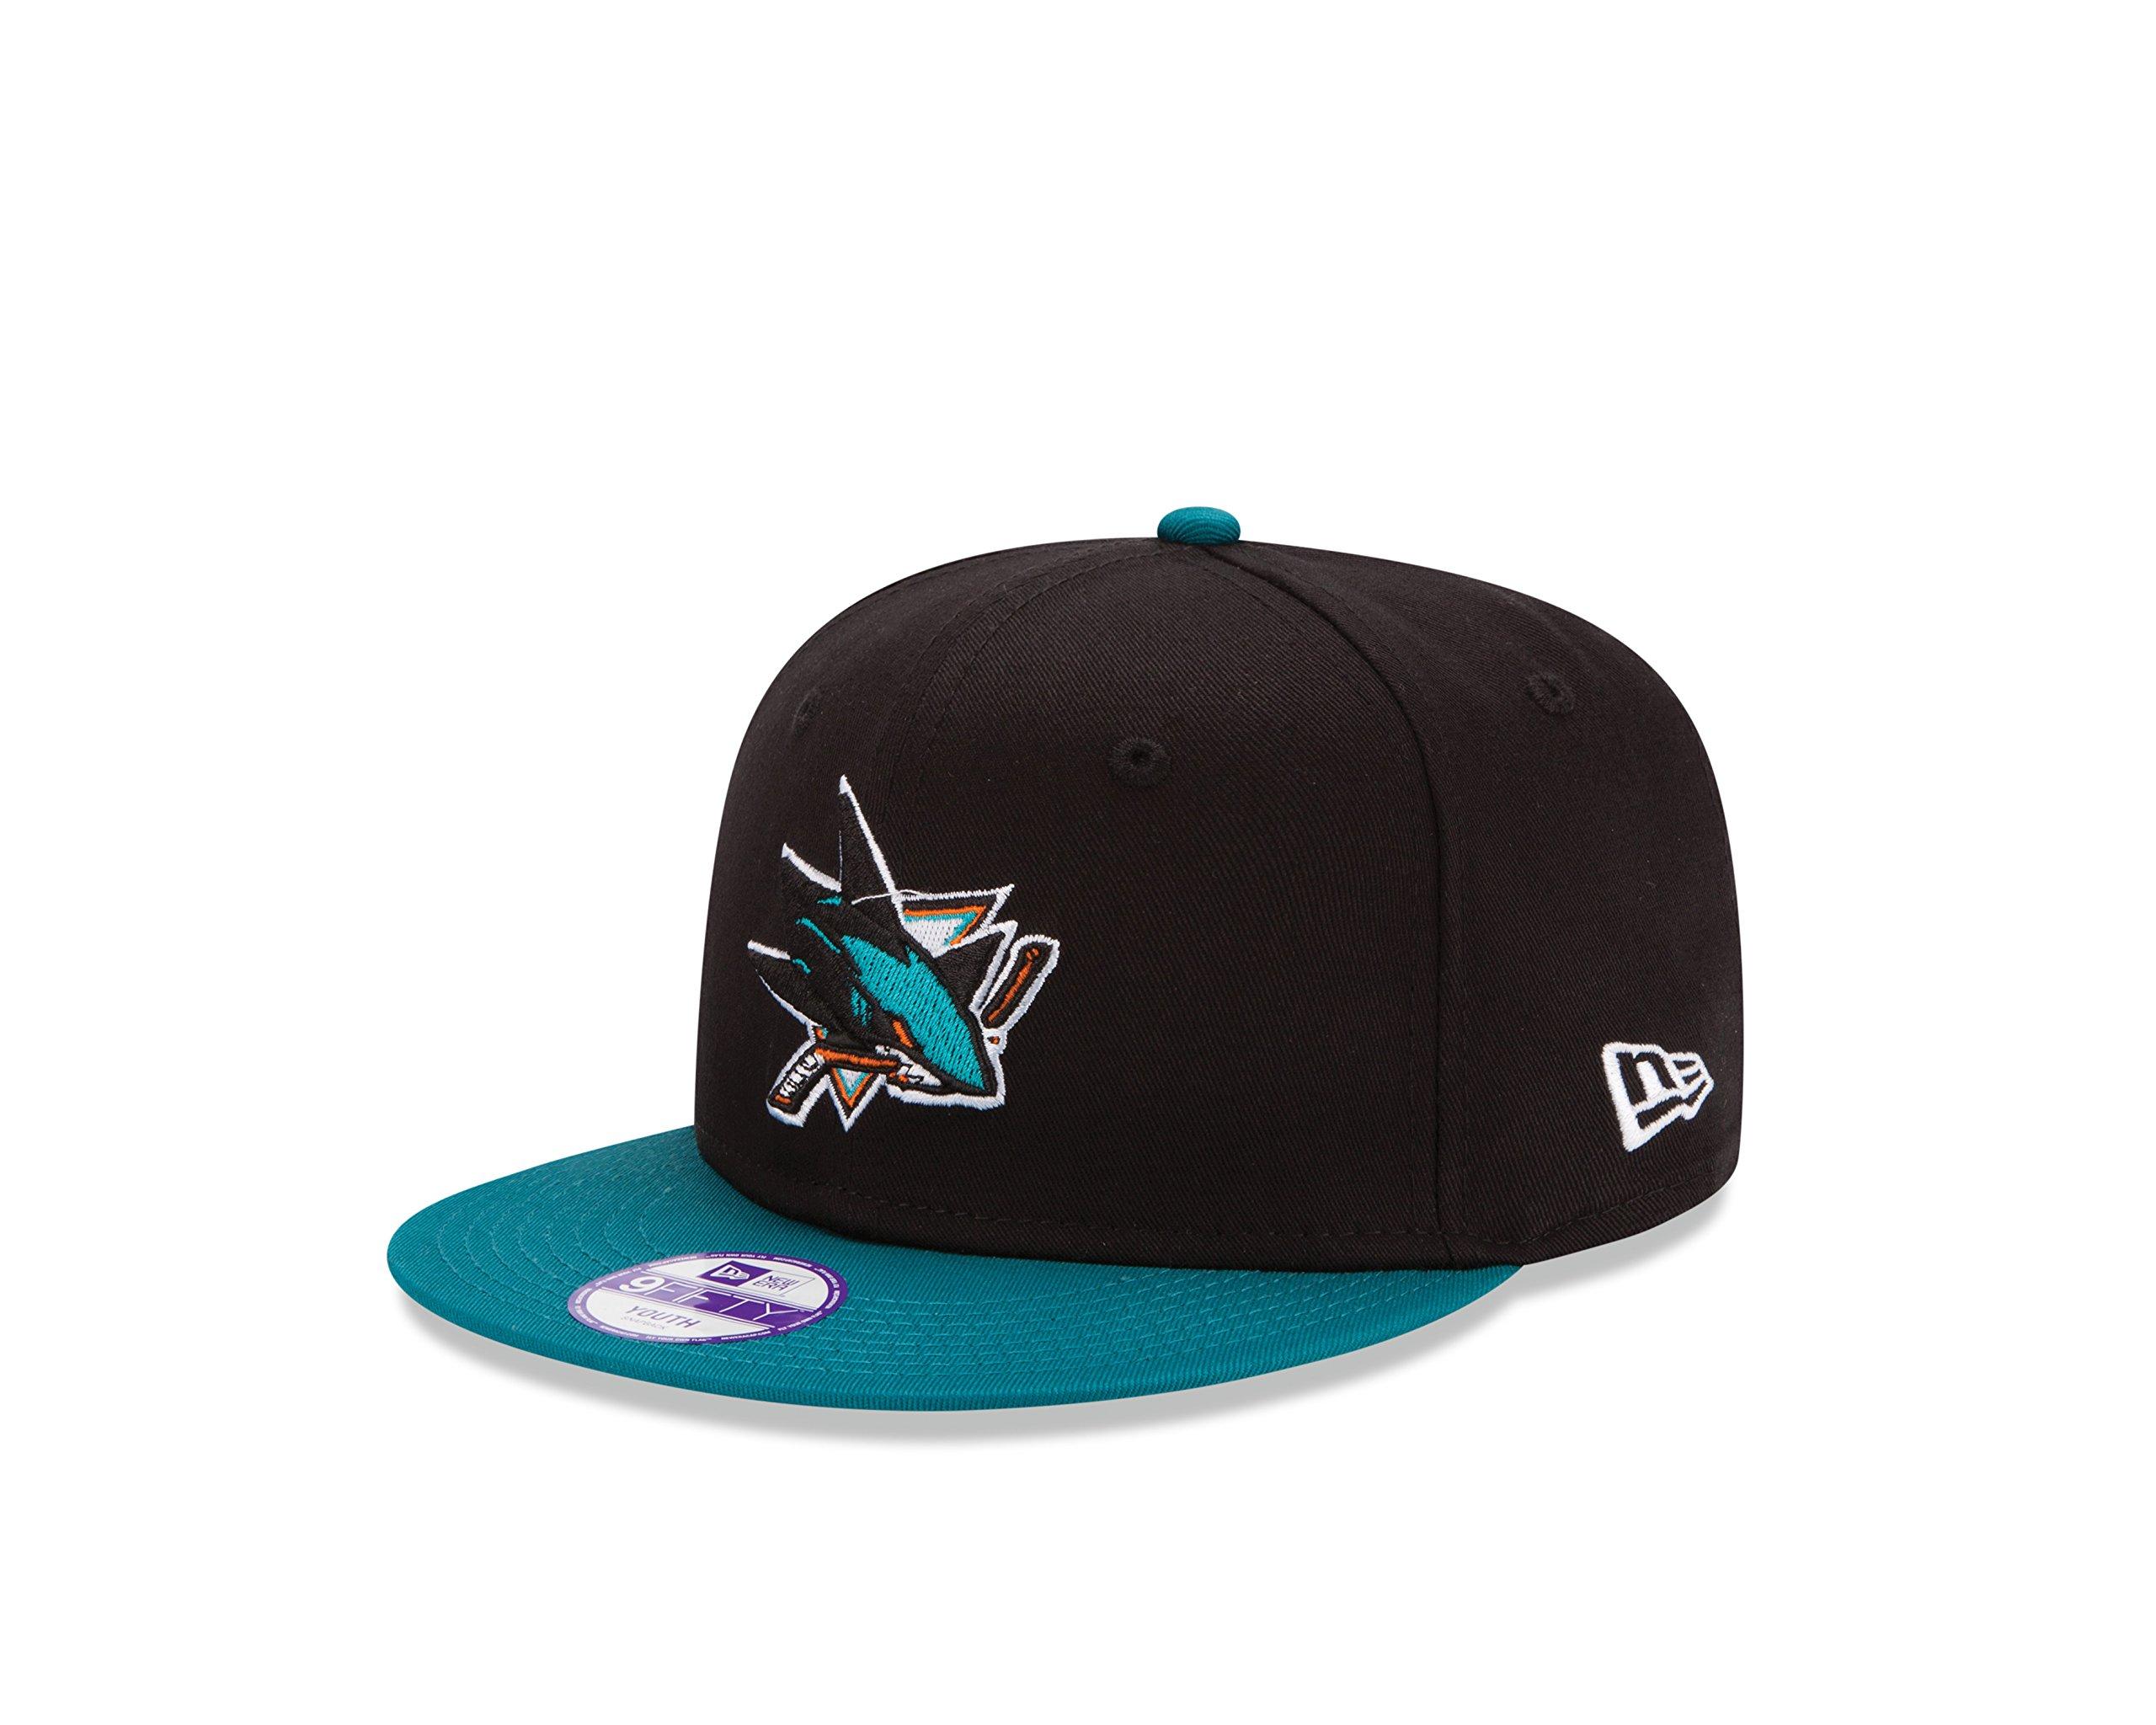 sneakers for cheap 1c6a6 0b988 Get Quotations · NHL San Jose Sharkes Kids 2Tone 9FIFTY Snapback Cap, Black